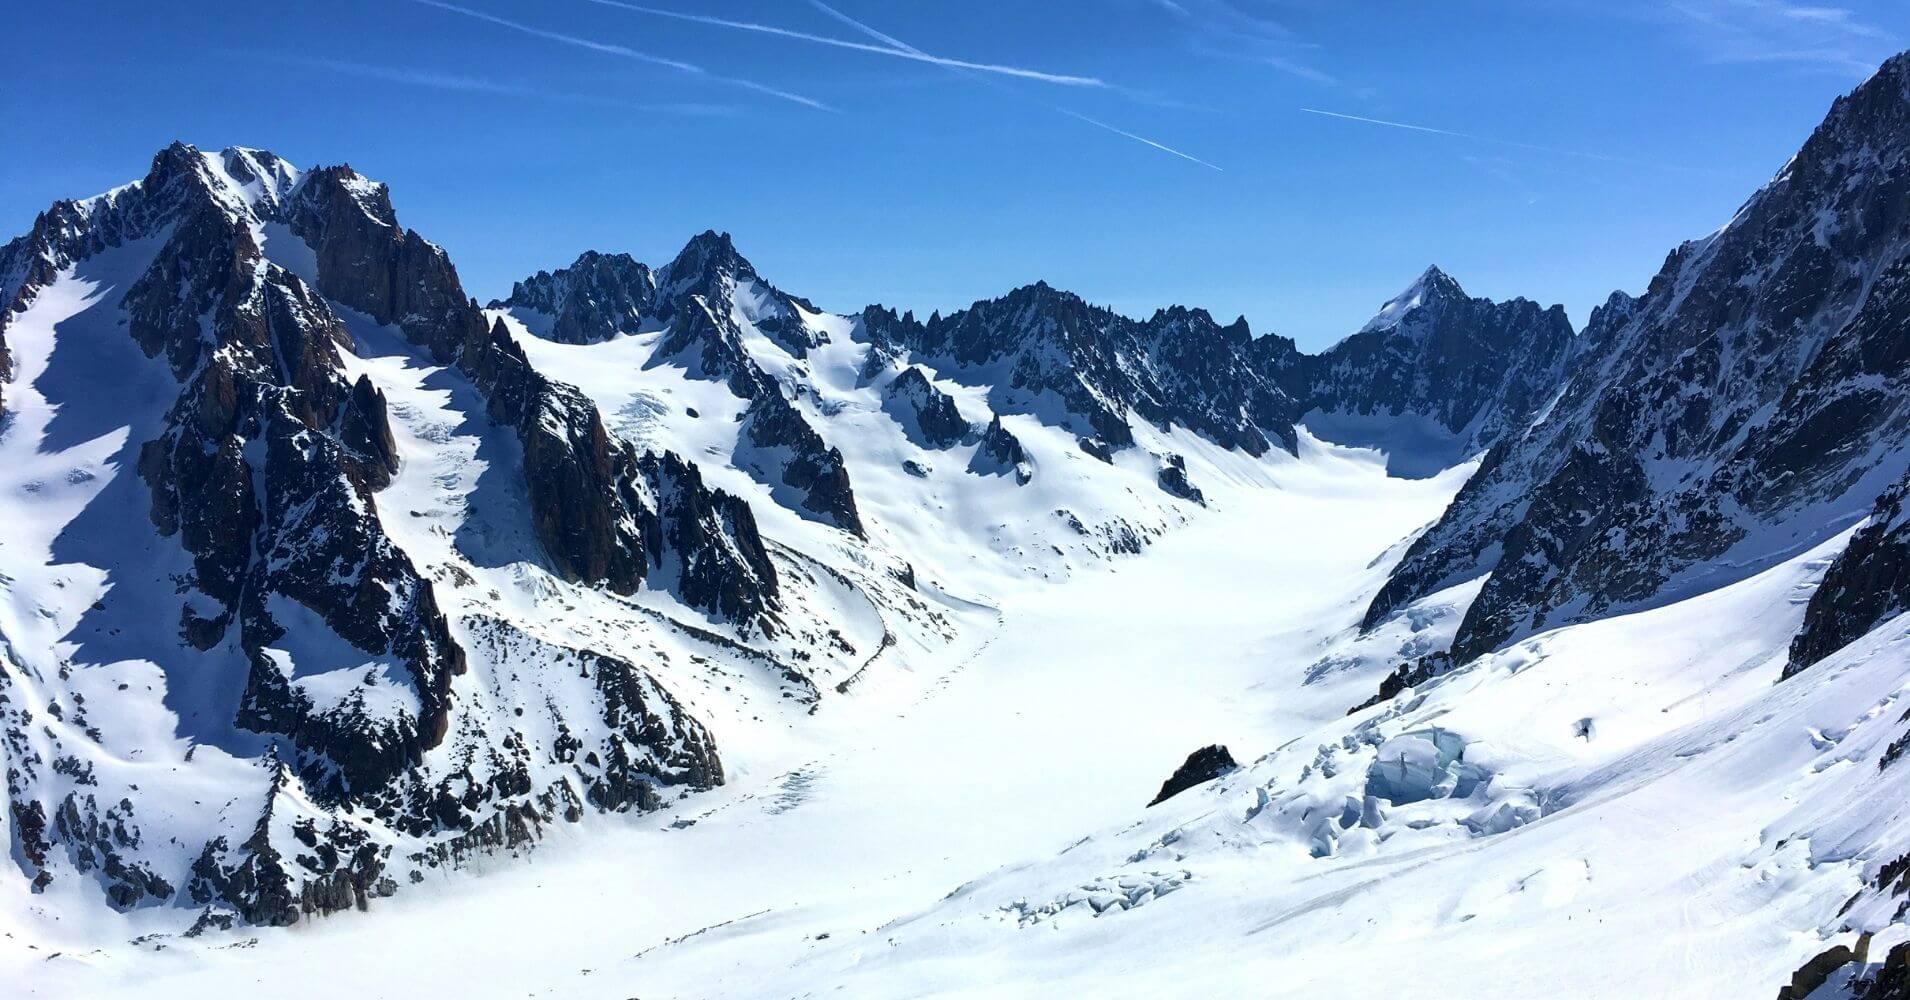 Glaciar de Argentier. Chamonix, Alta Saboya. Auvernia-Ródano-Alpes. Francia.